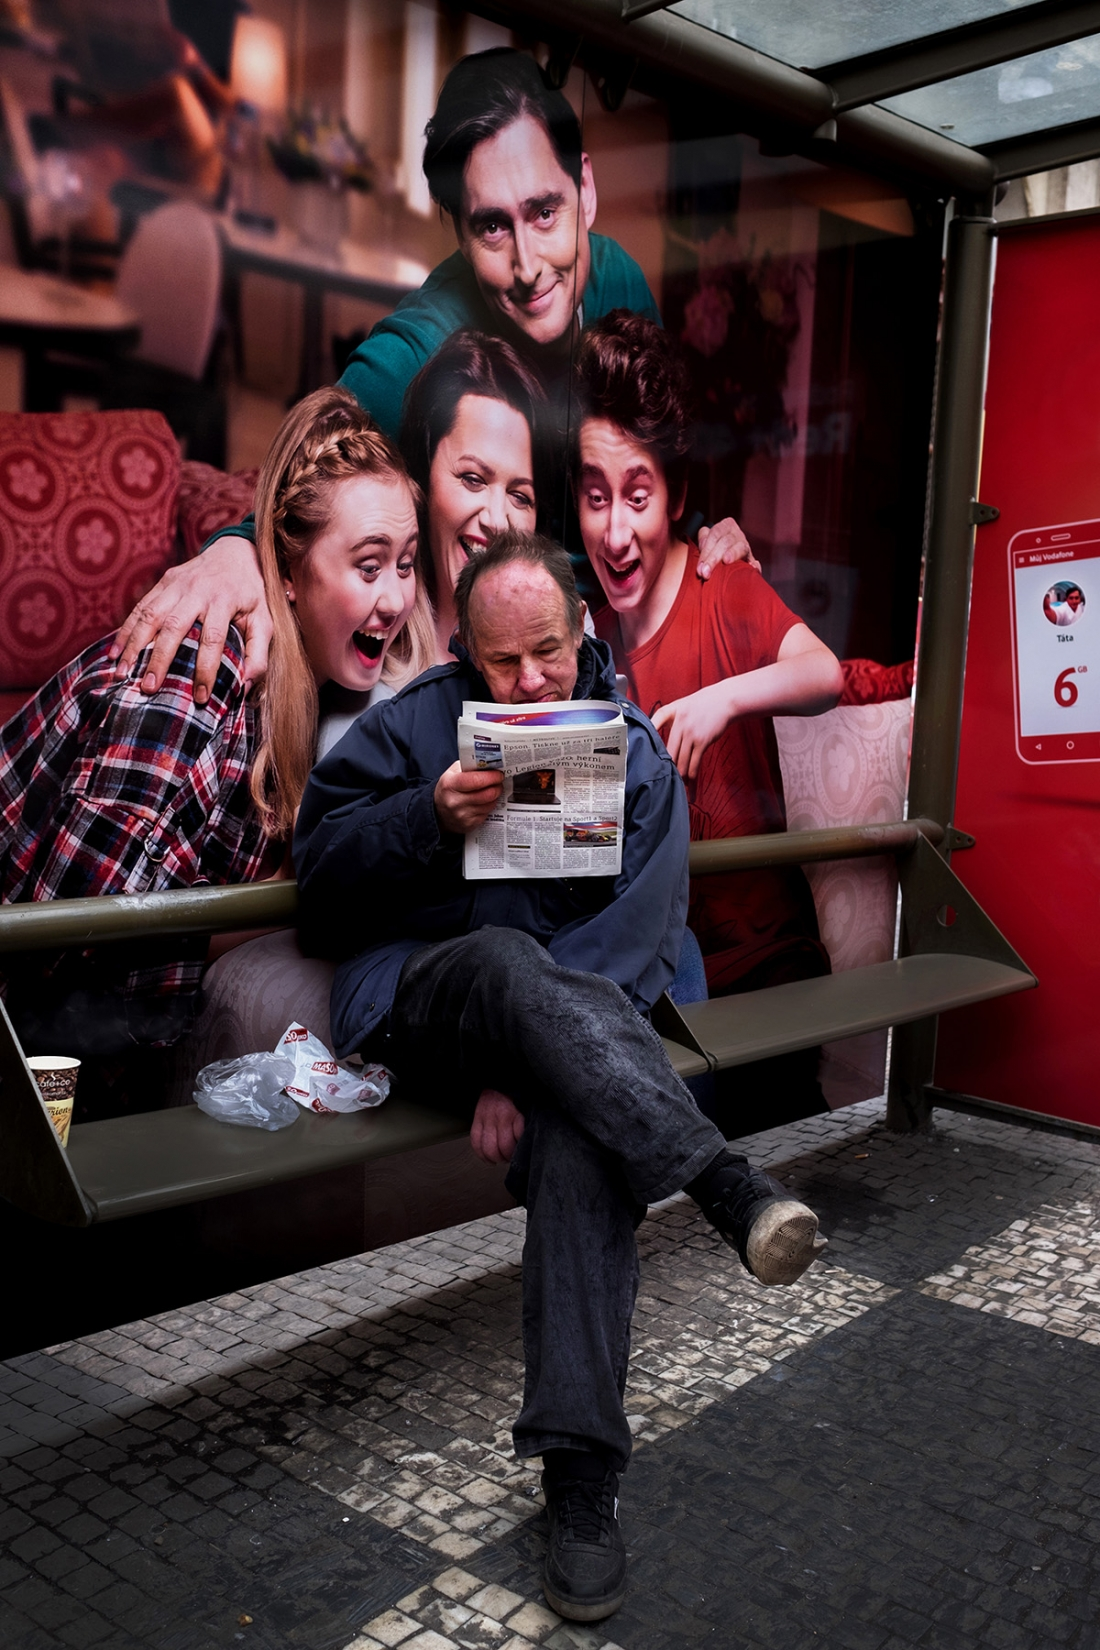 Copyright: © Martin Schubert, Czech Republic, Entry, Open, Street Photography (Open competition), 2018 Sony World Photography Awards